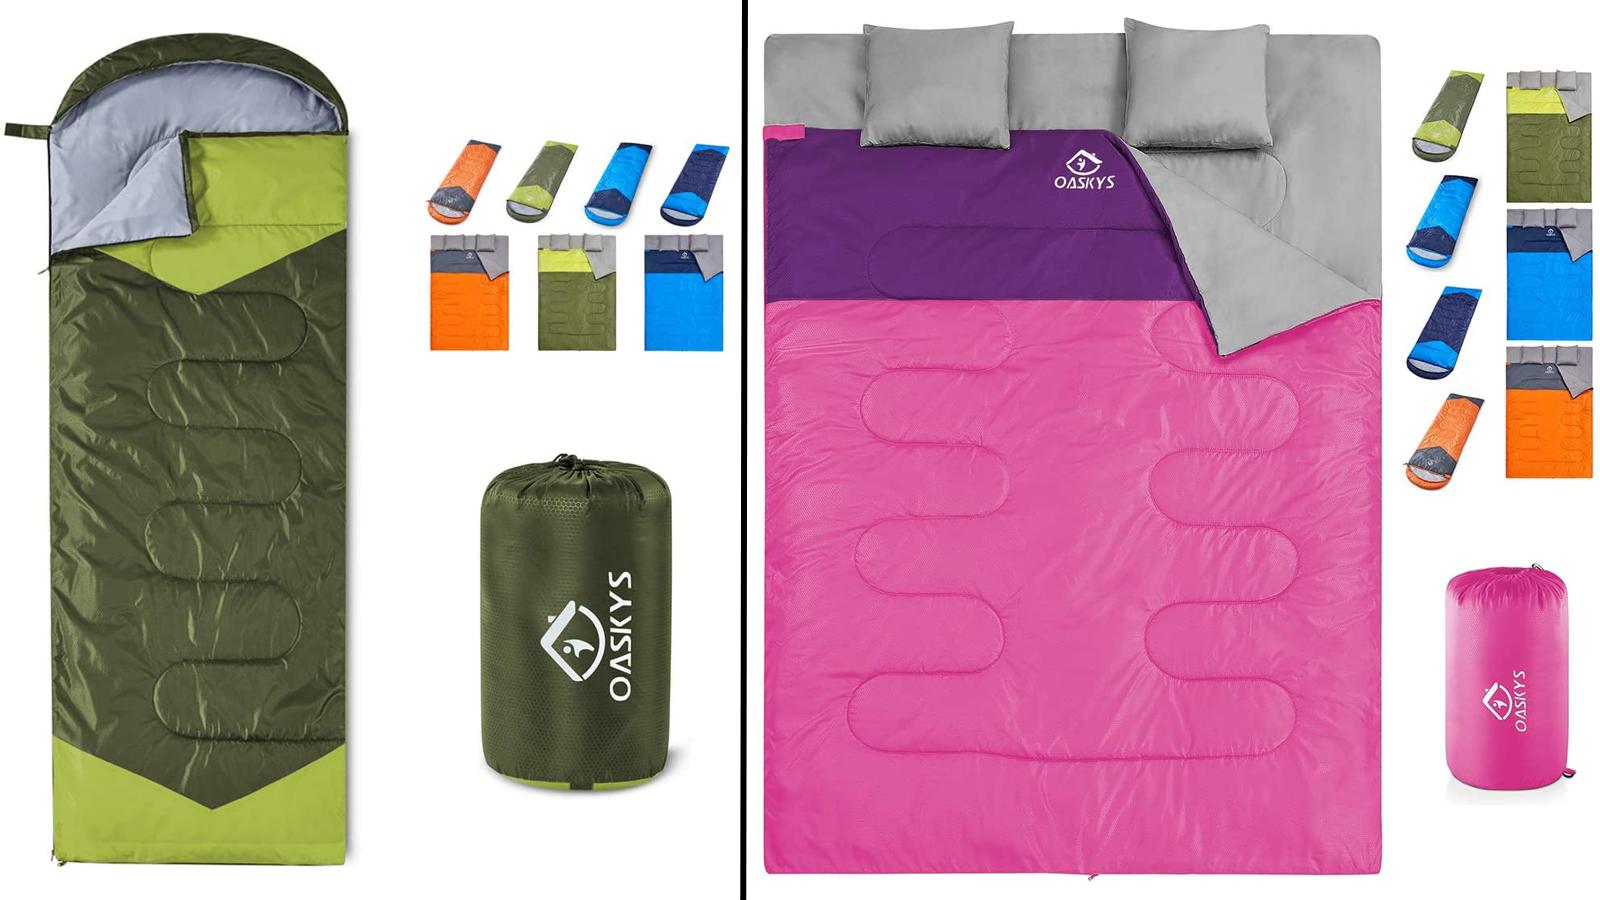 Take This Lightweight Three-Season Sleeping Bag on Your Summer Camping Trip